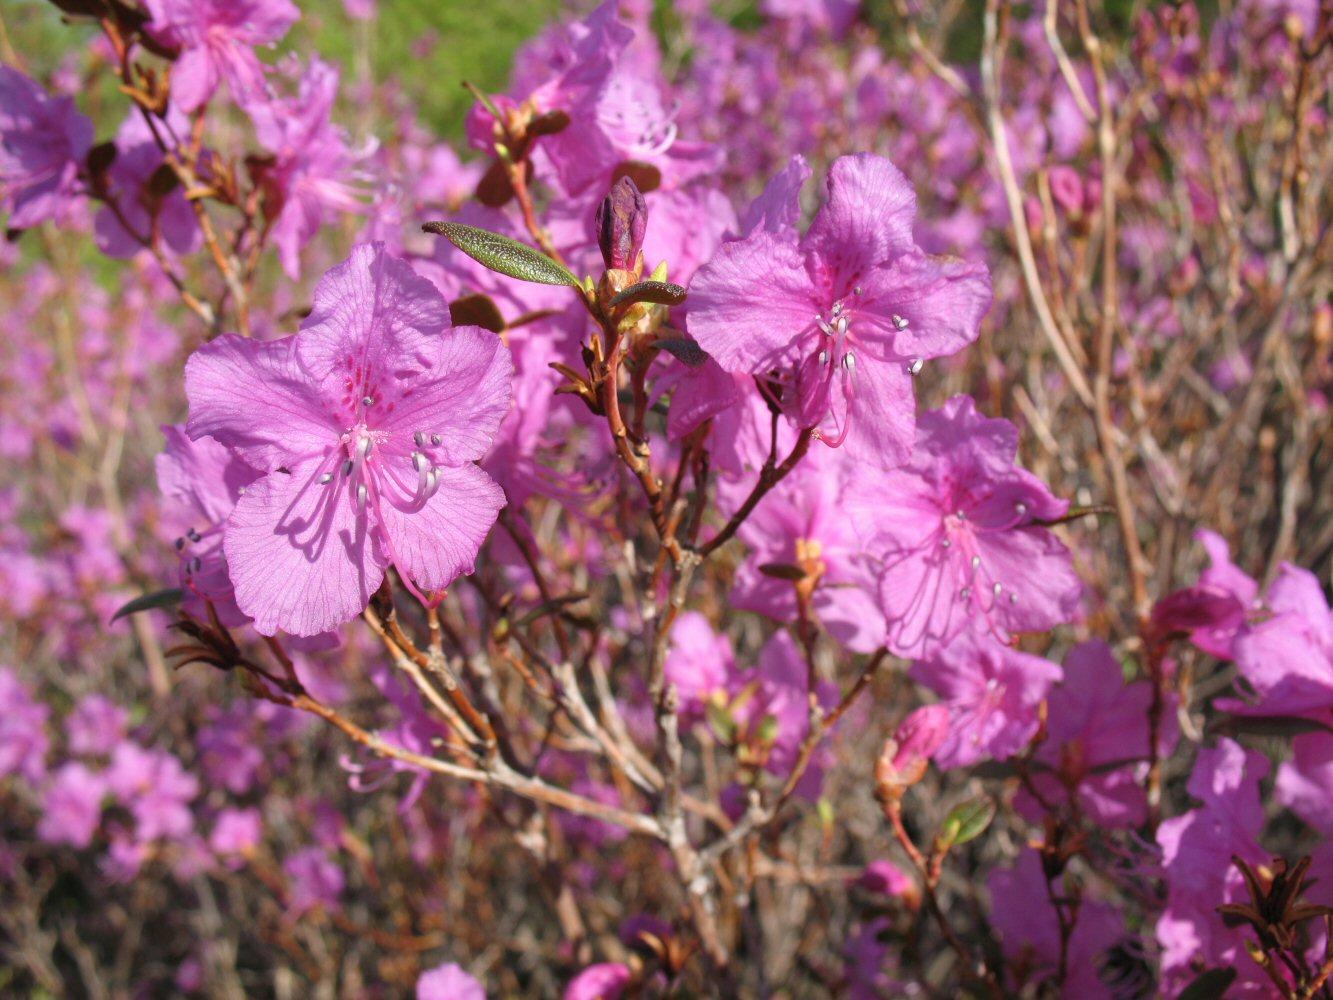 Рододендрон даурский: посадка и уход, рекомендации садоводов